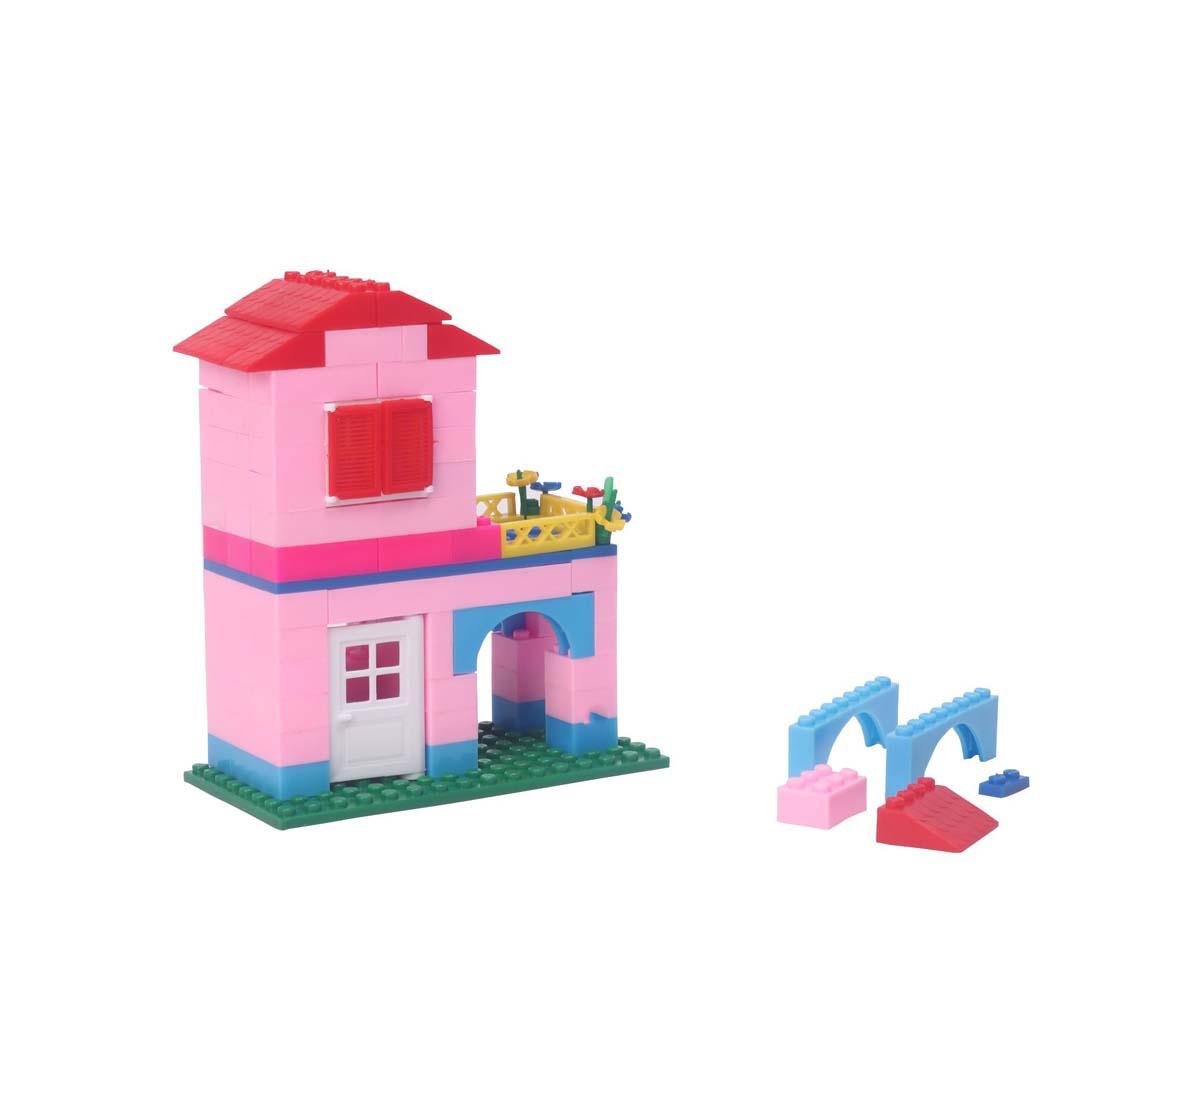 Peacock | Peacock Smart Dream House 135 Pcs Generic Blocks for Kids age 5Y+